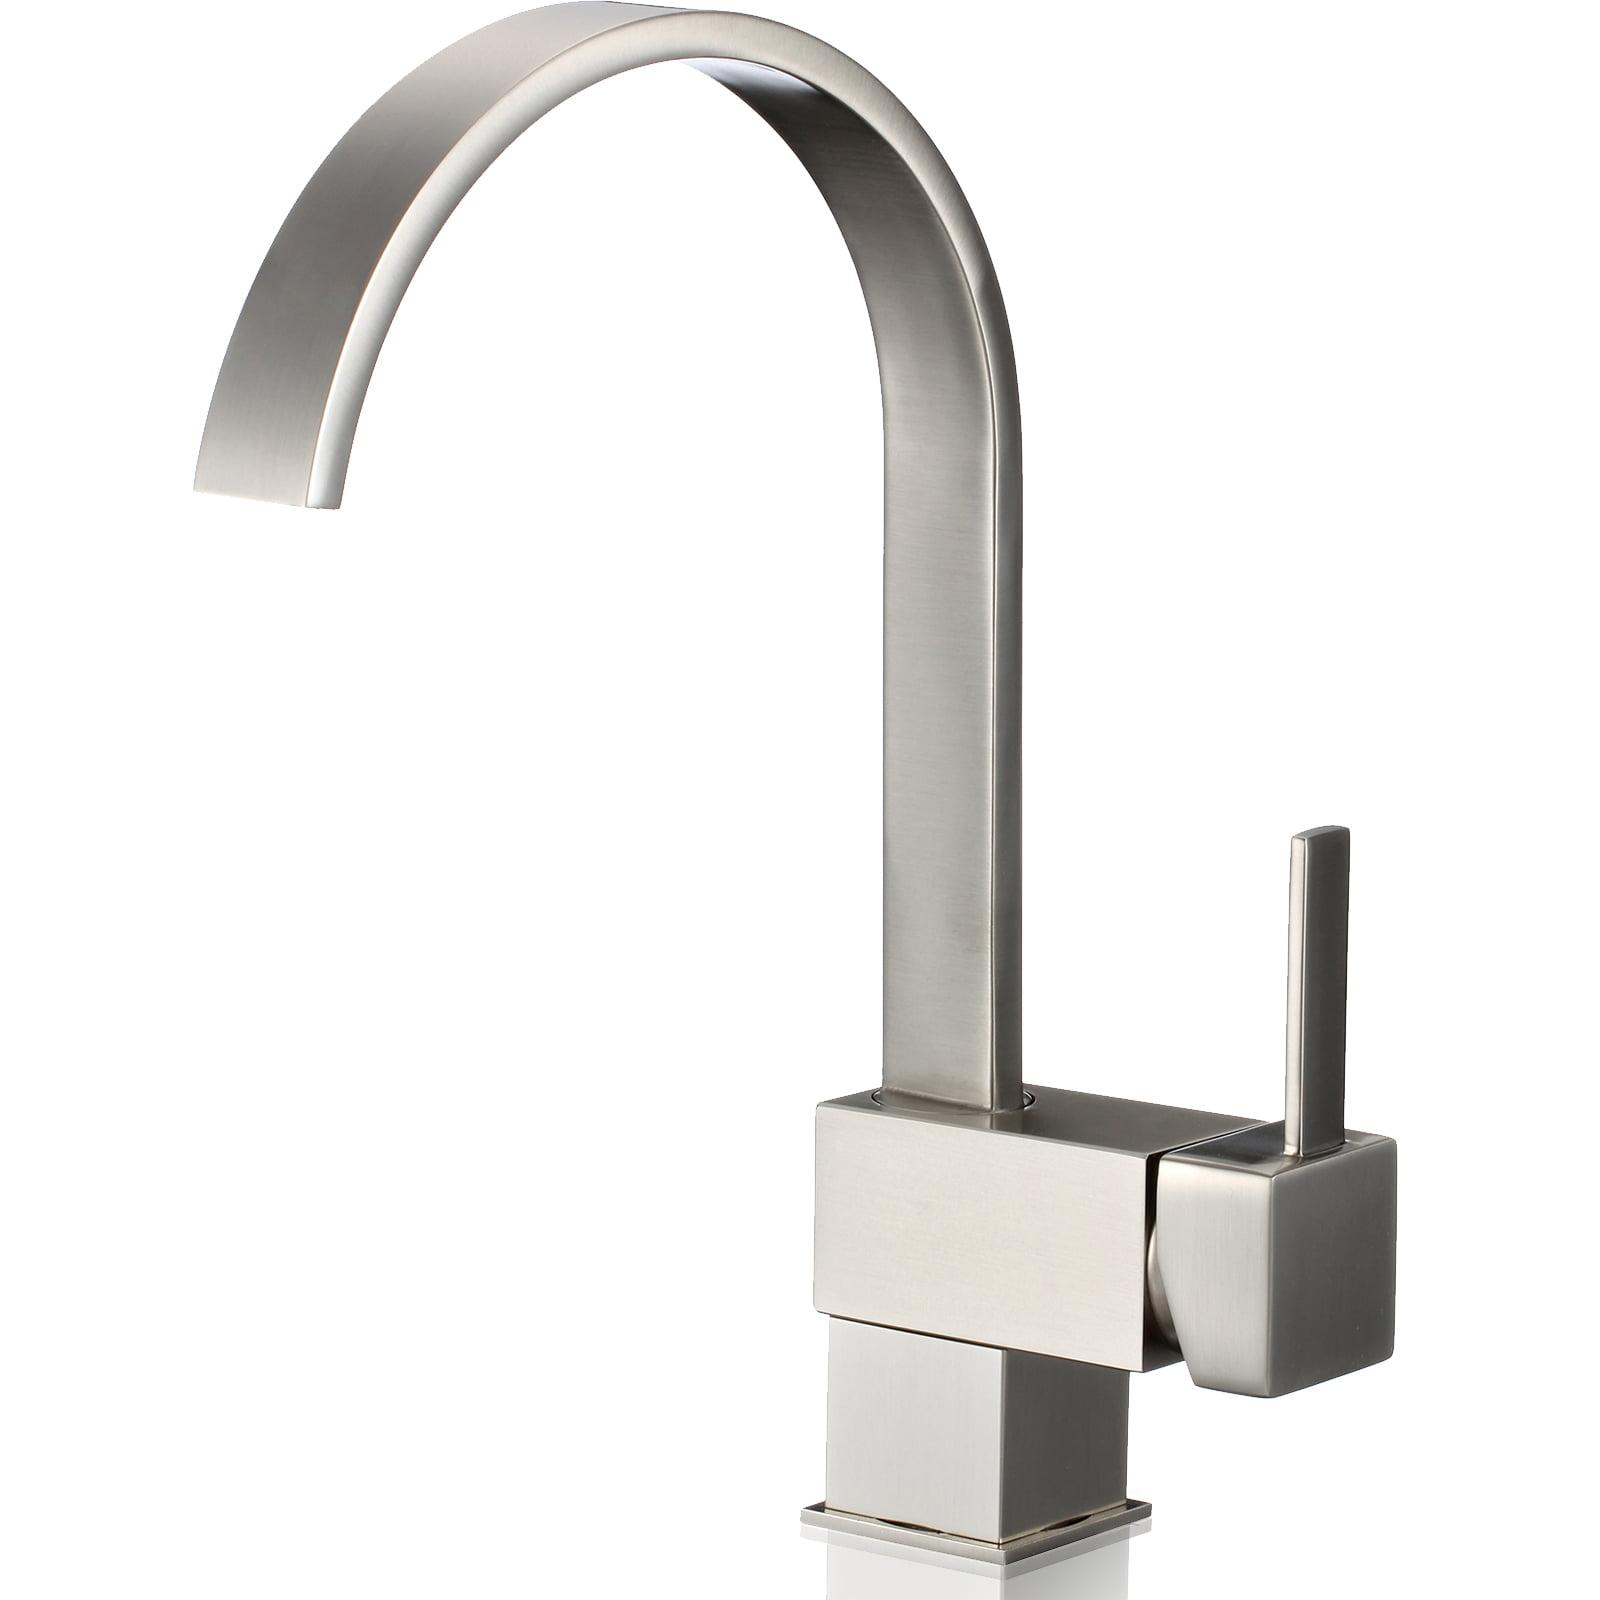 Ispring L8208bn Single Handle 360 Degree Swivel Kitchenbar Sink